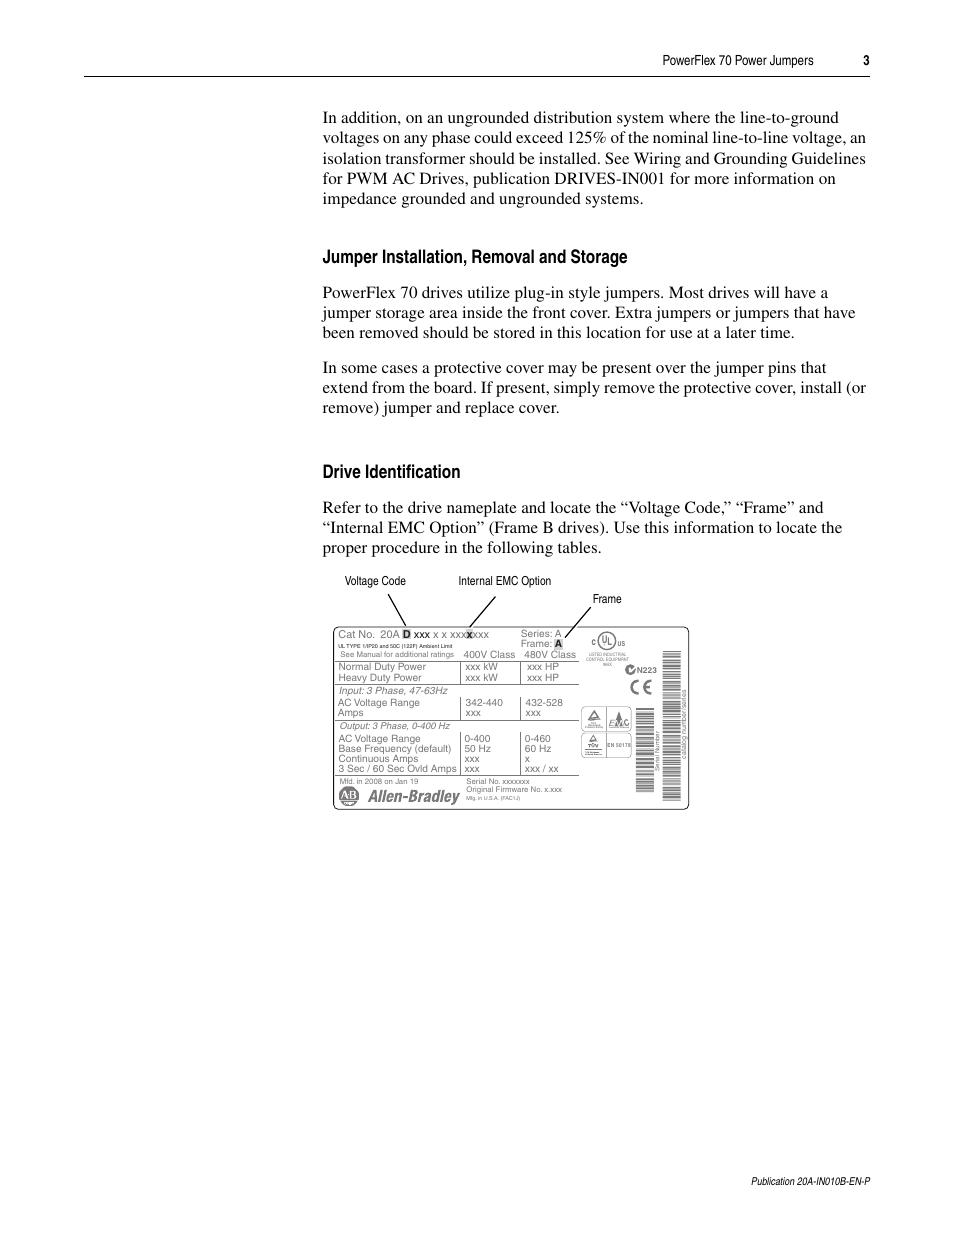 powerflex 400 user manual pdf